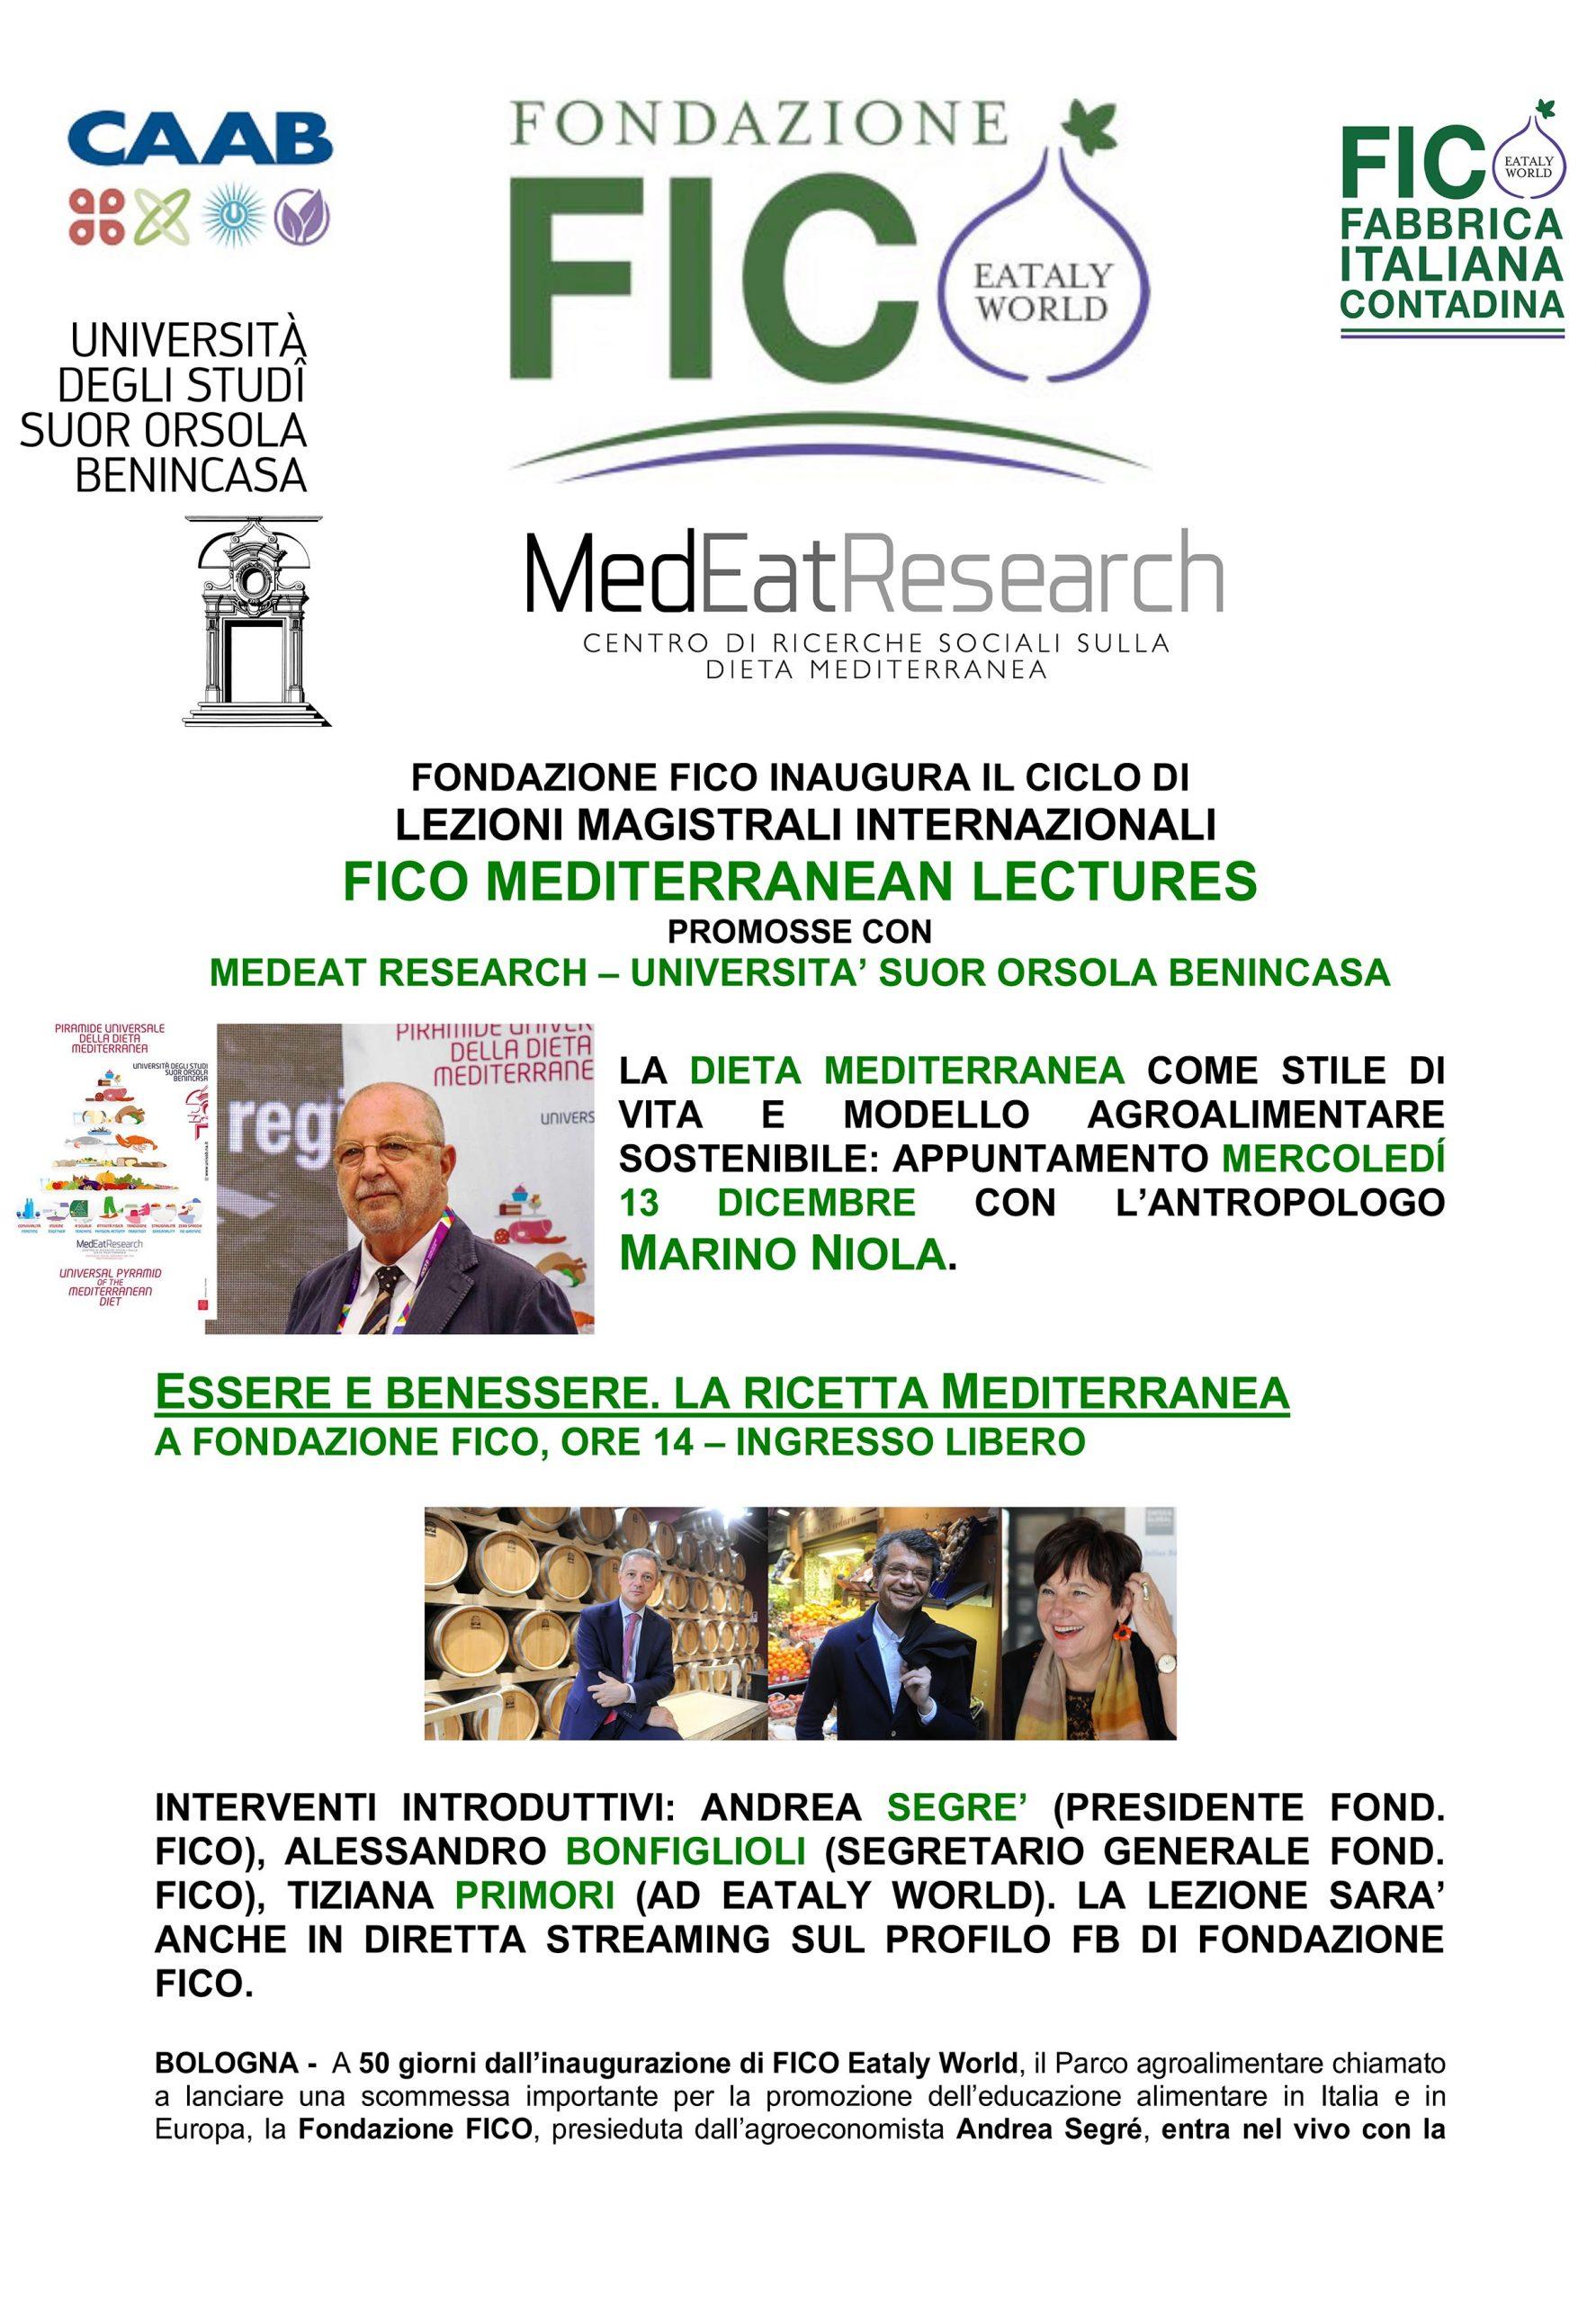 CS-0007-Mediterranea-lecture-13-12-2017_Pagina_1